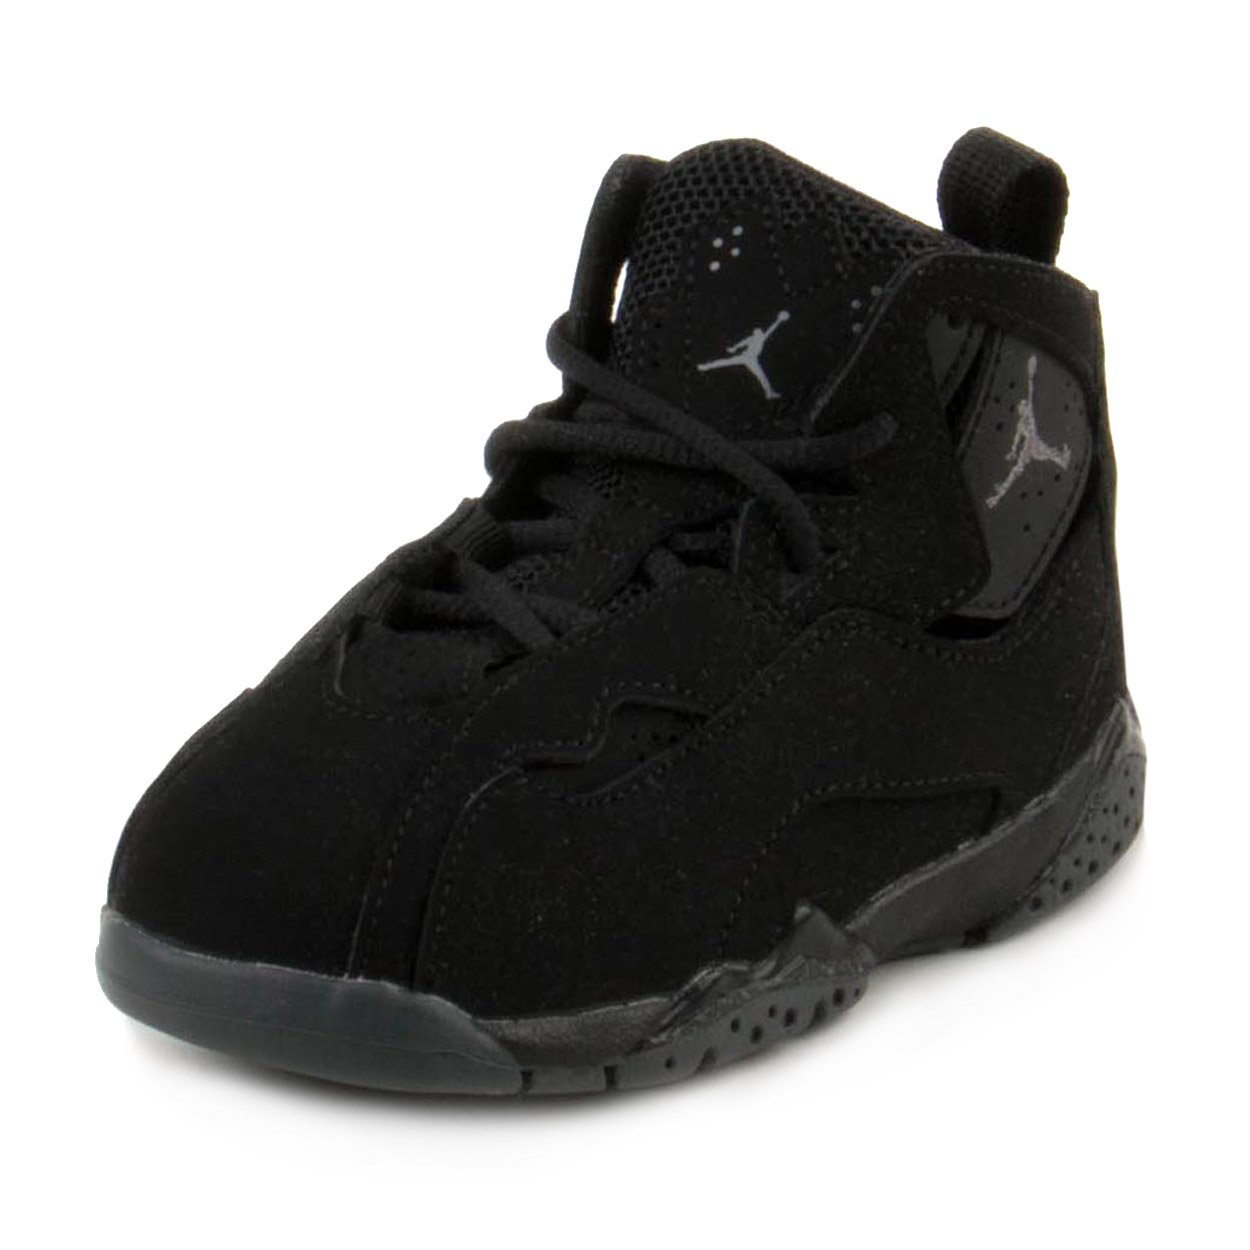 Nike Toddler Boy's Jordan True Flight Black/Dark Grey 5C